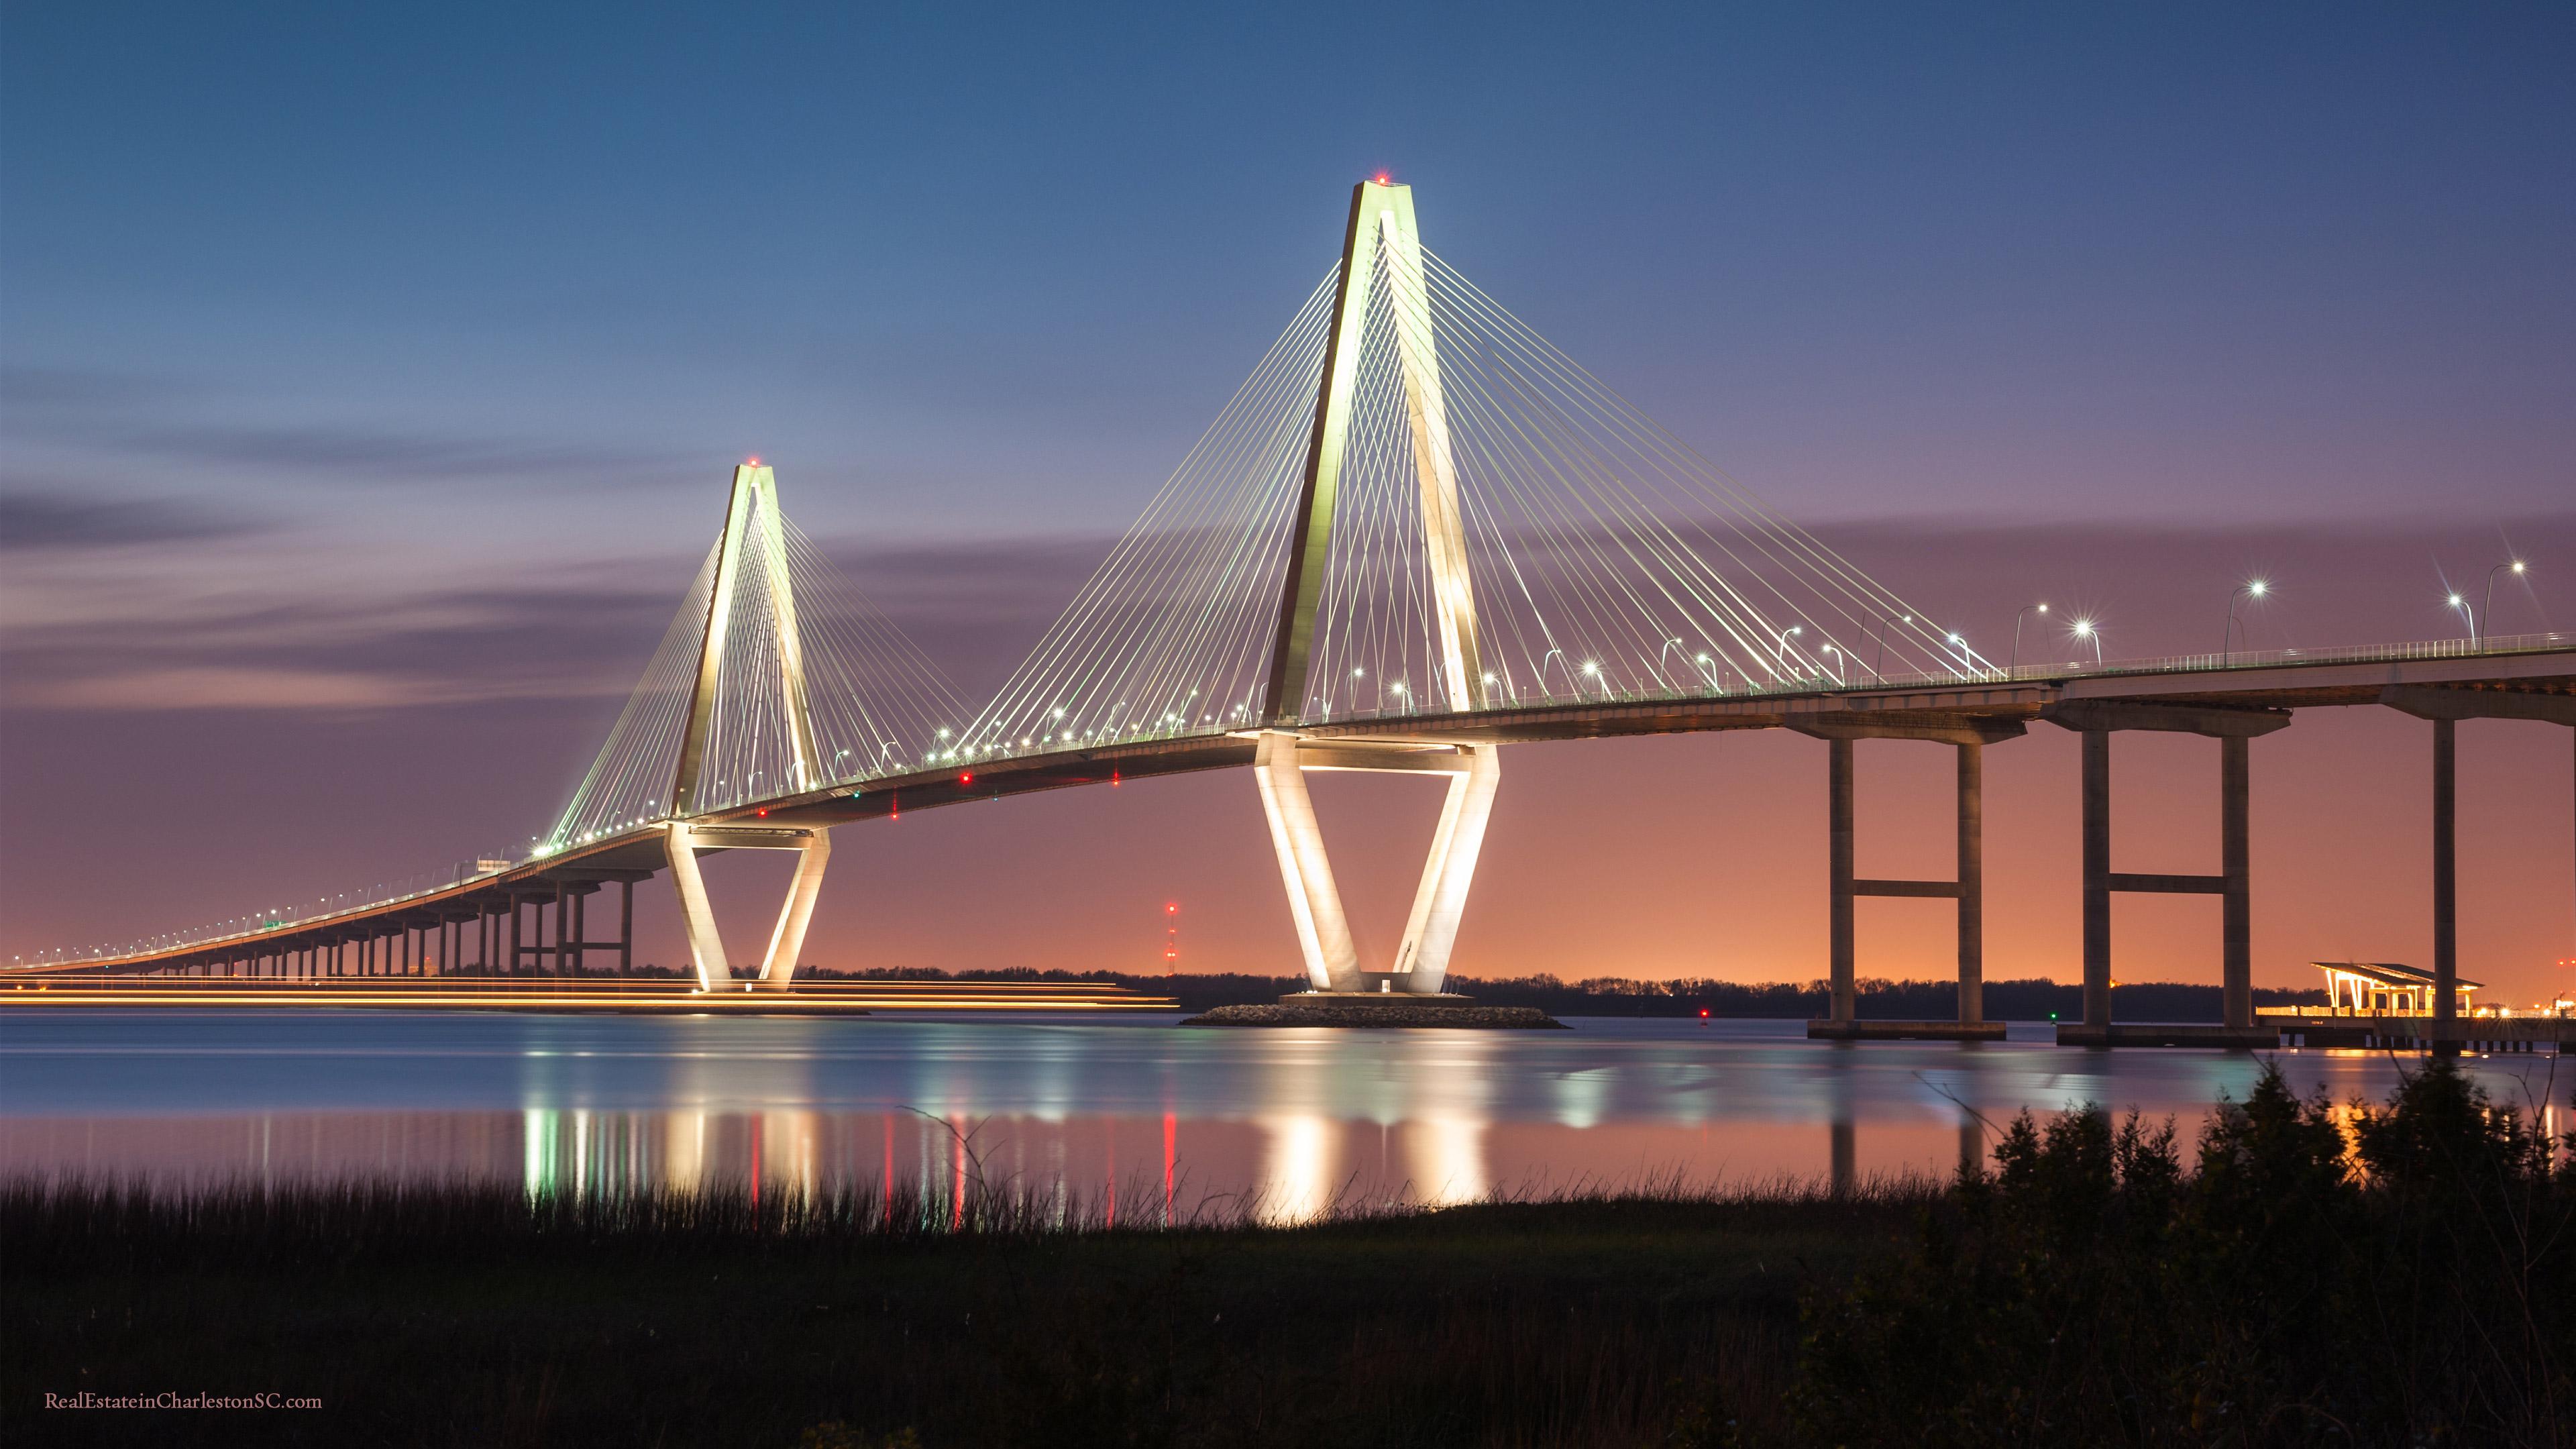 Charleston SC Wallpapers 3840x2160